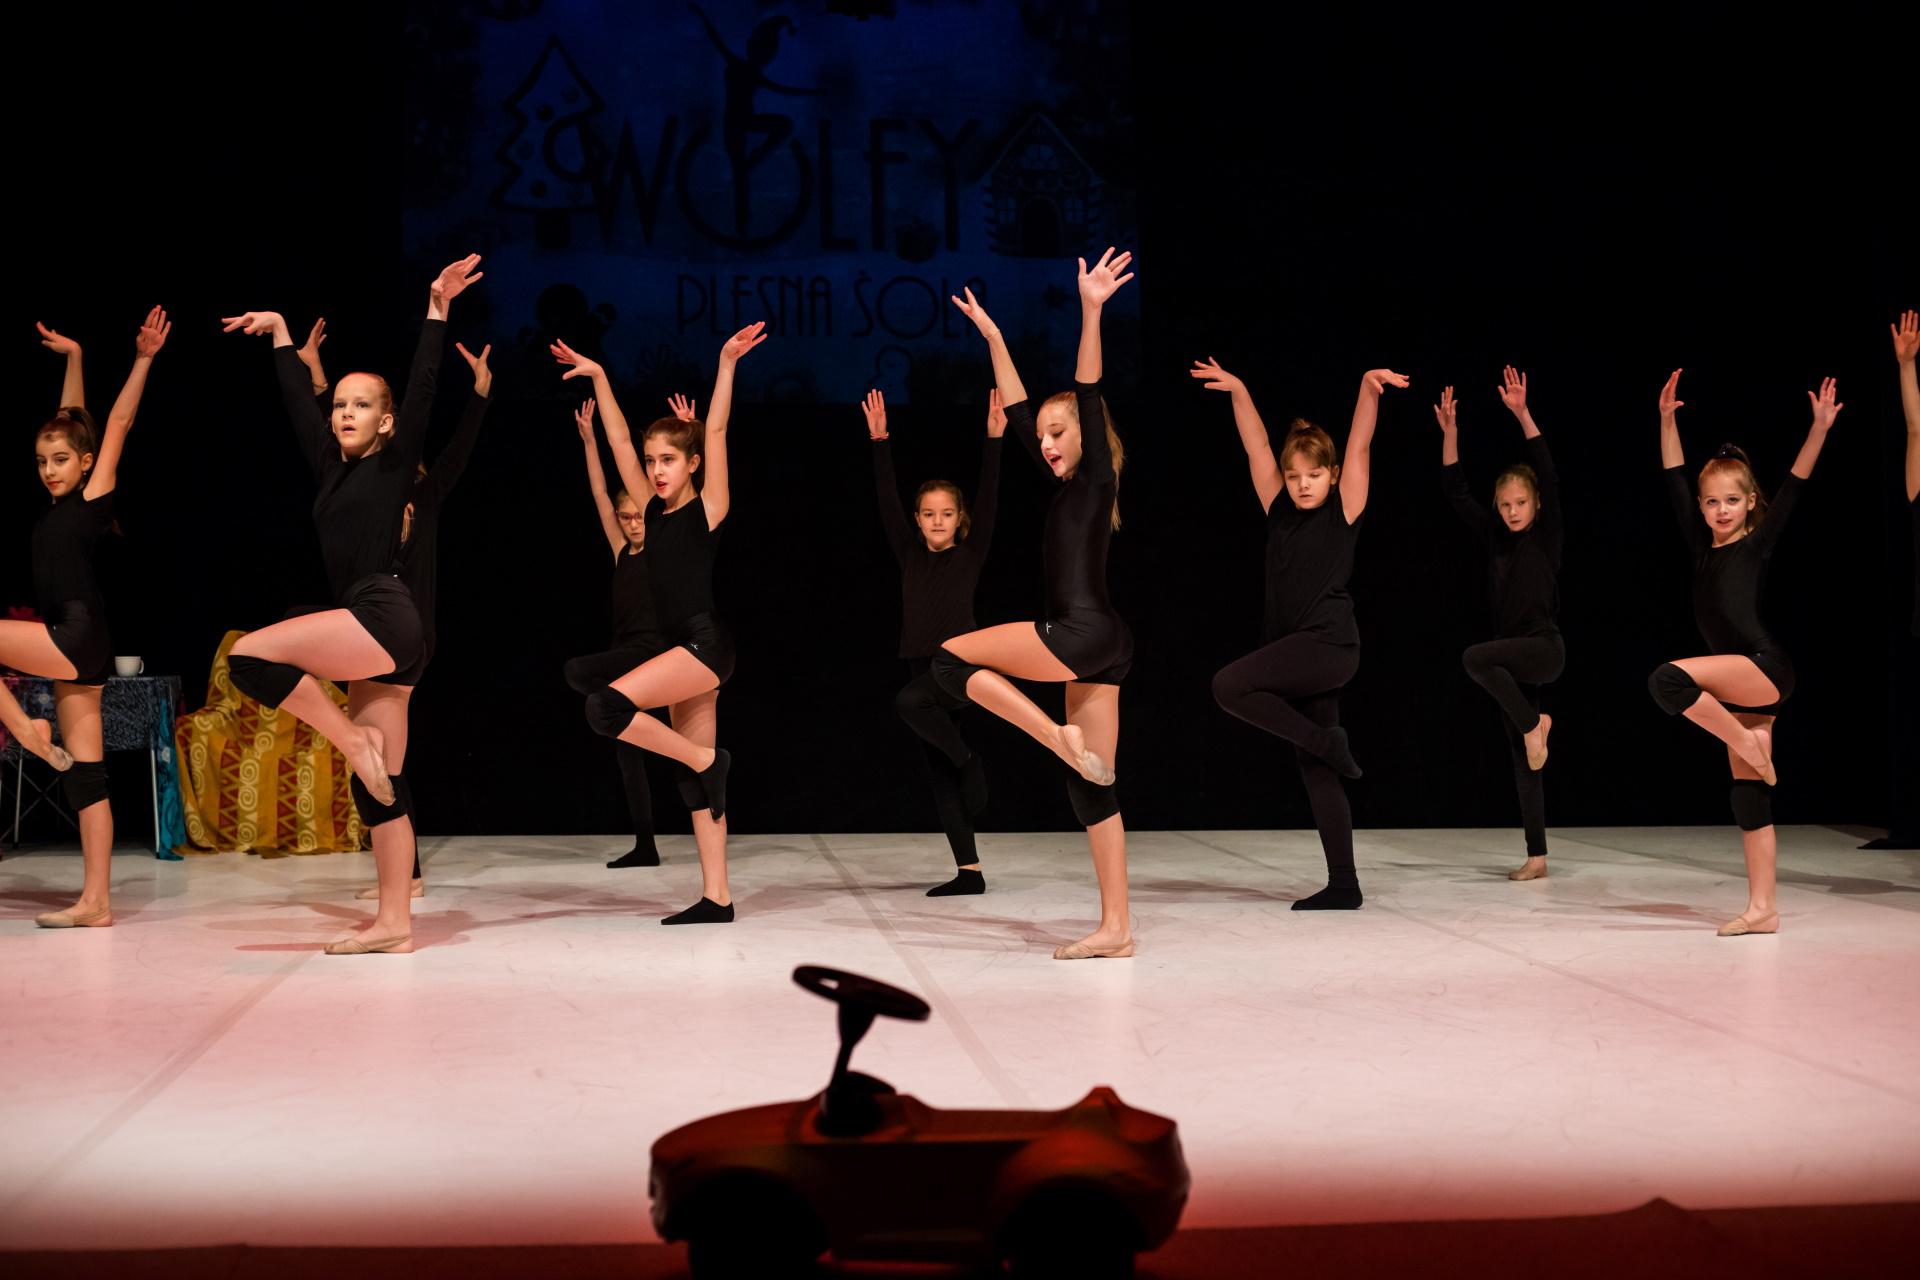 jazz-balet-1-plesna-sola-wolfy